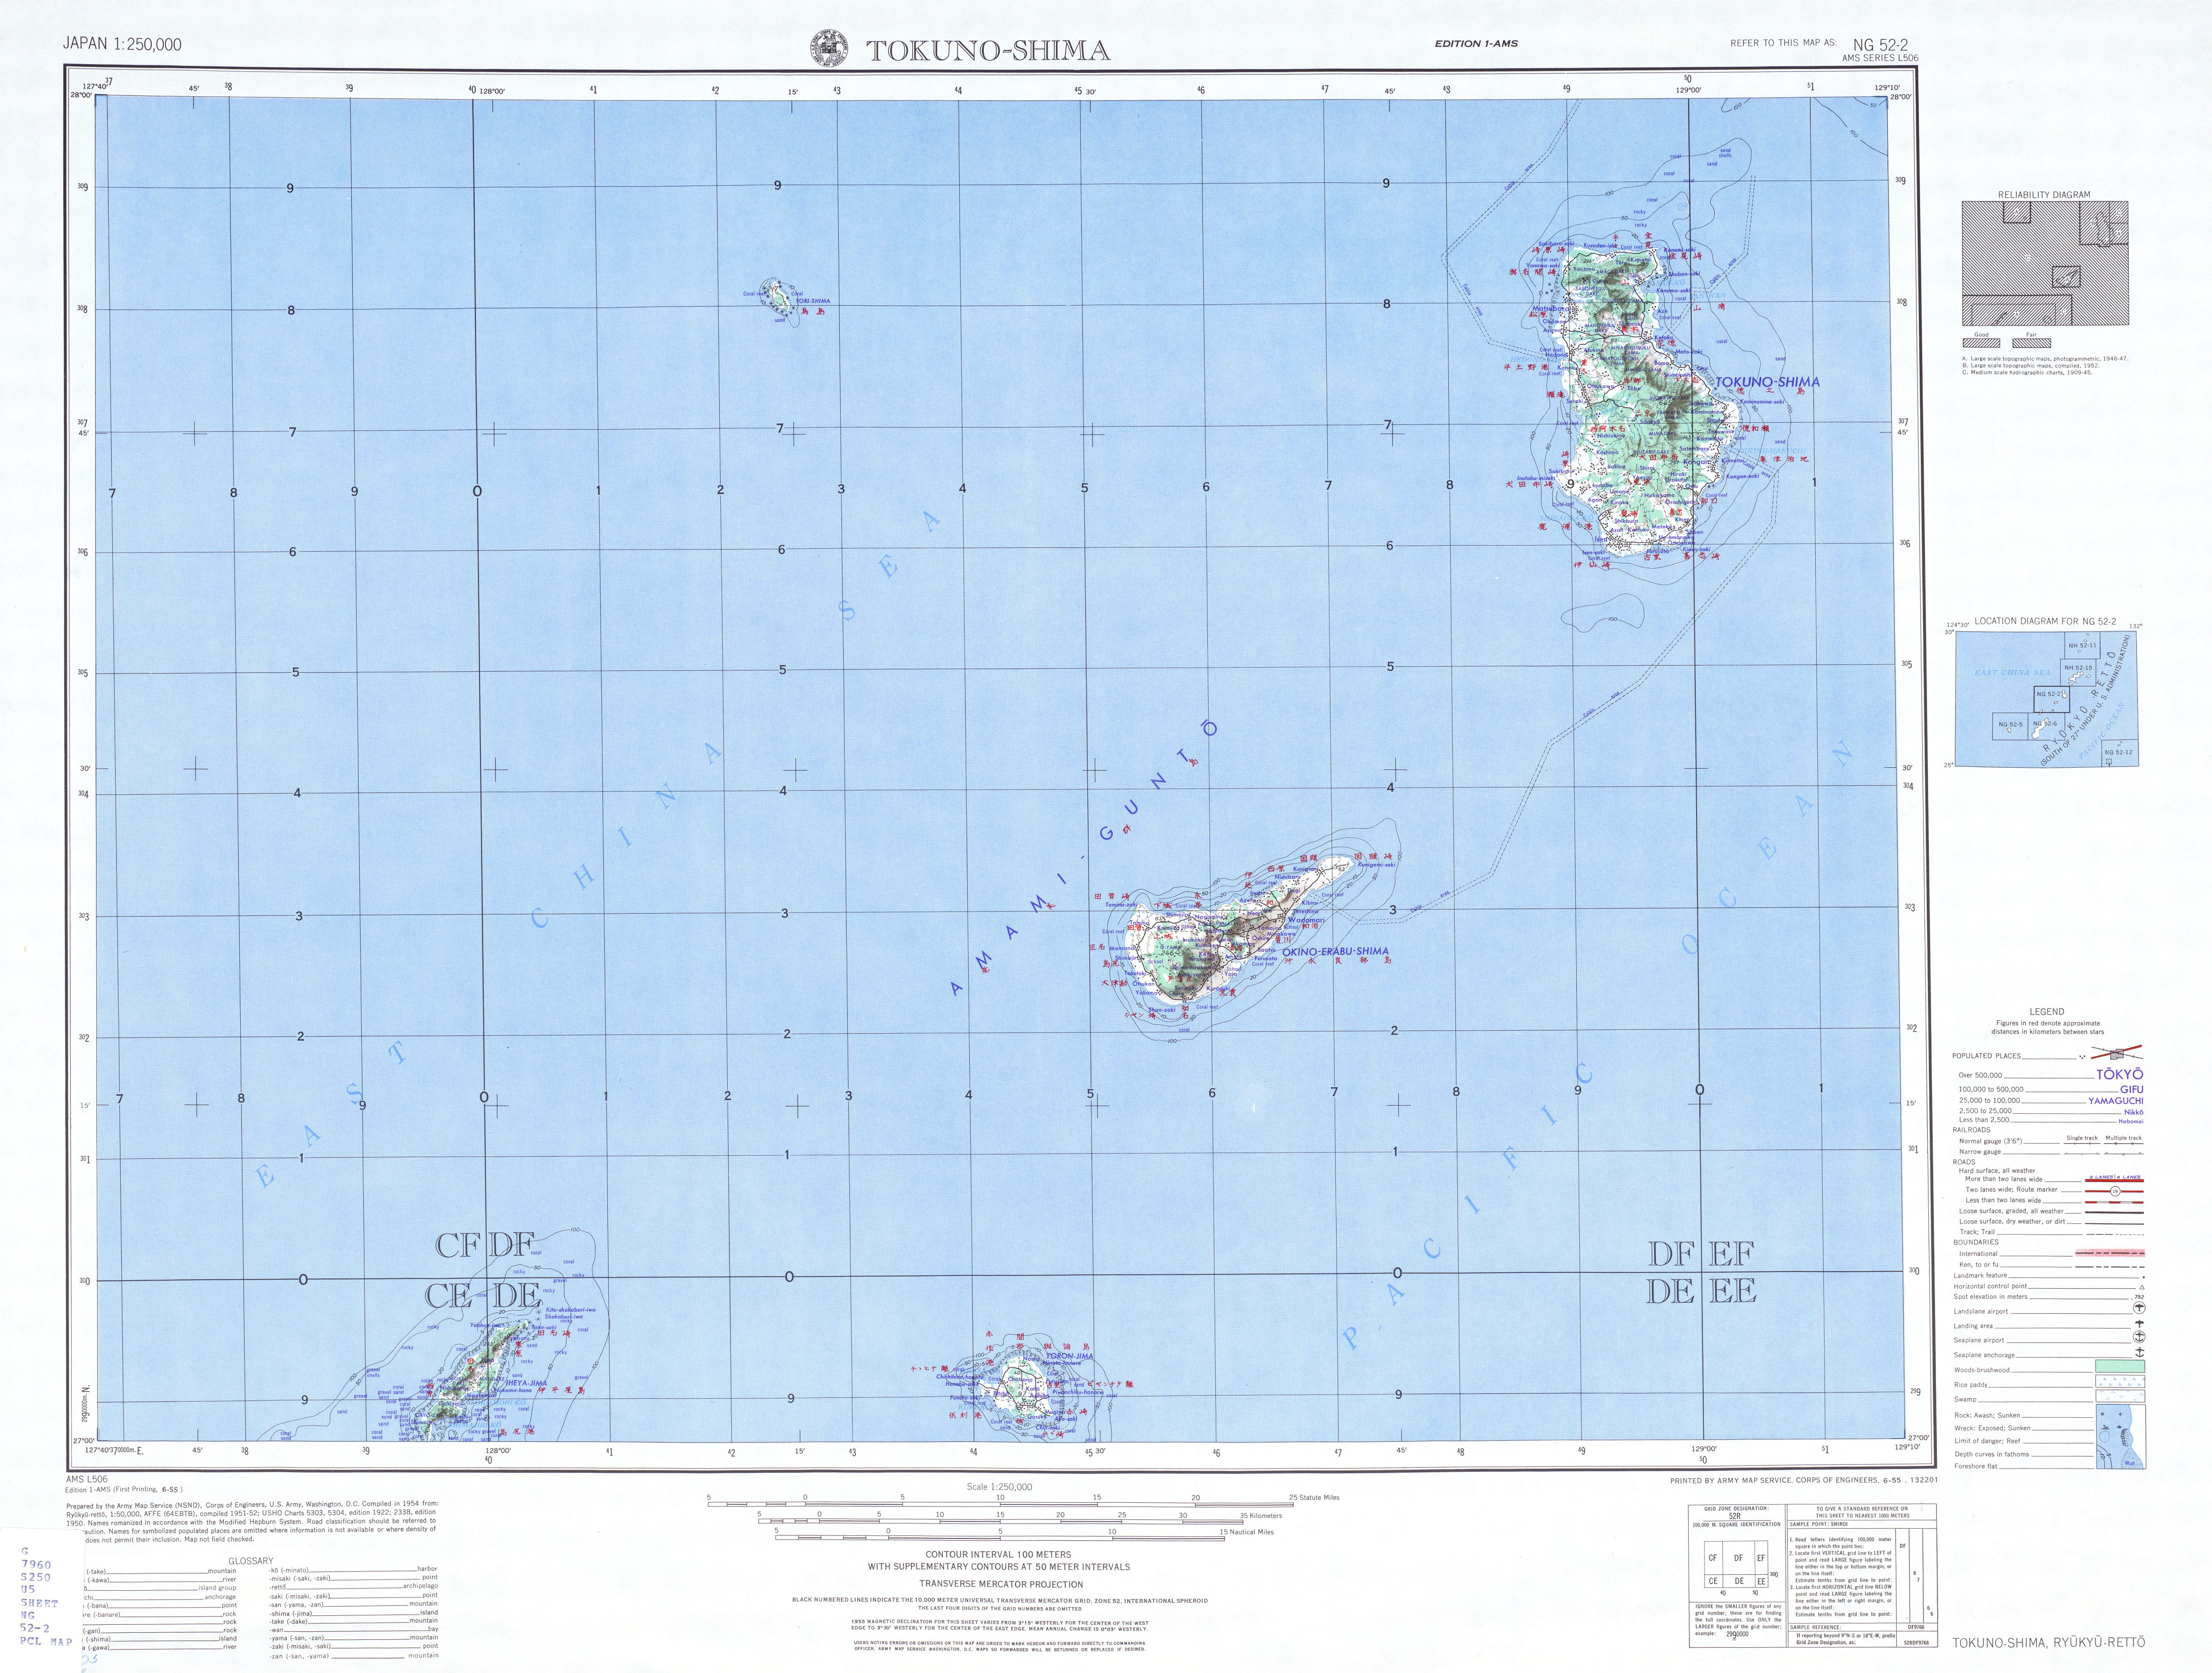 Tokuno-Shima Topographic Map Sheet, Japan 1954